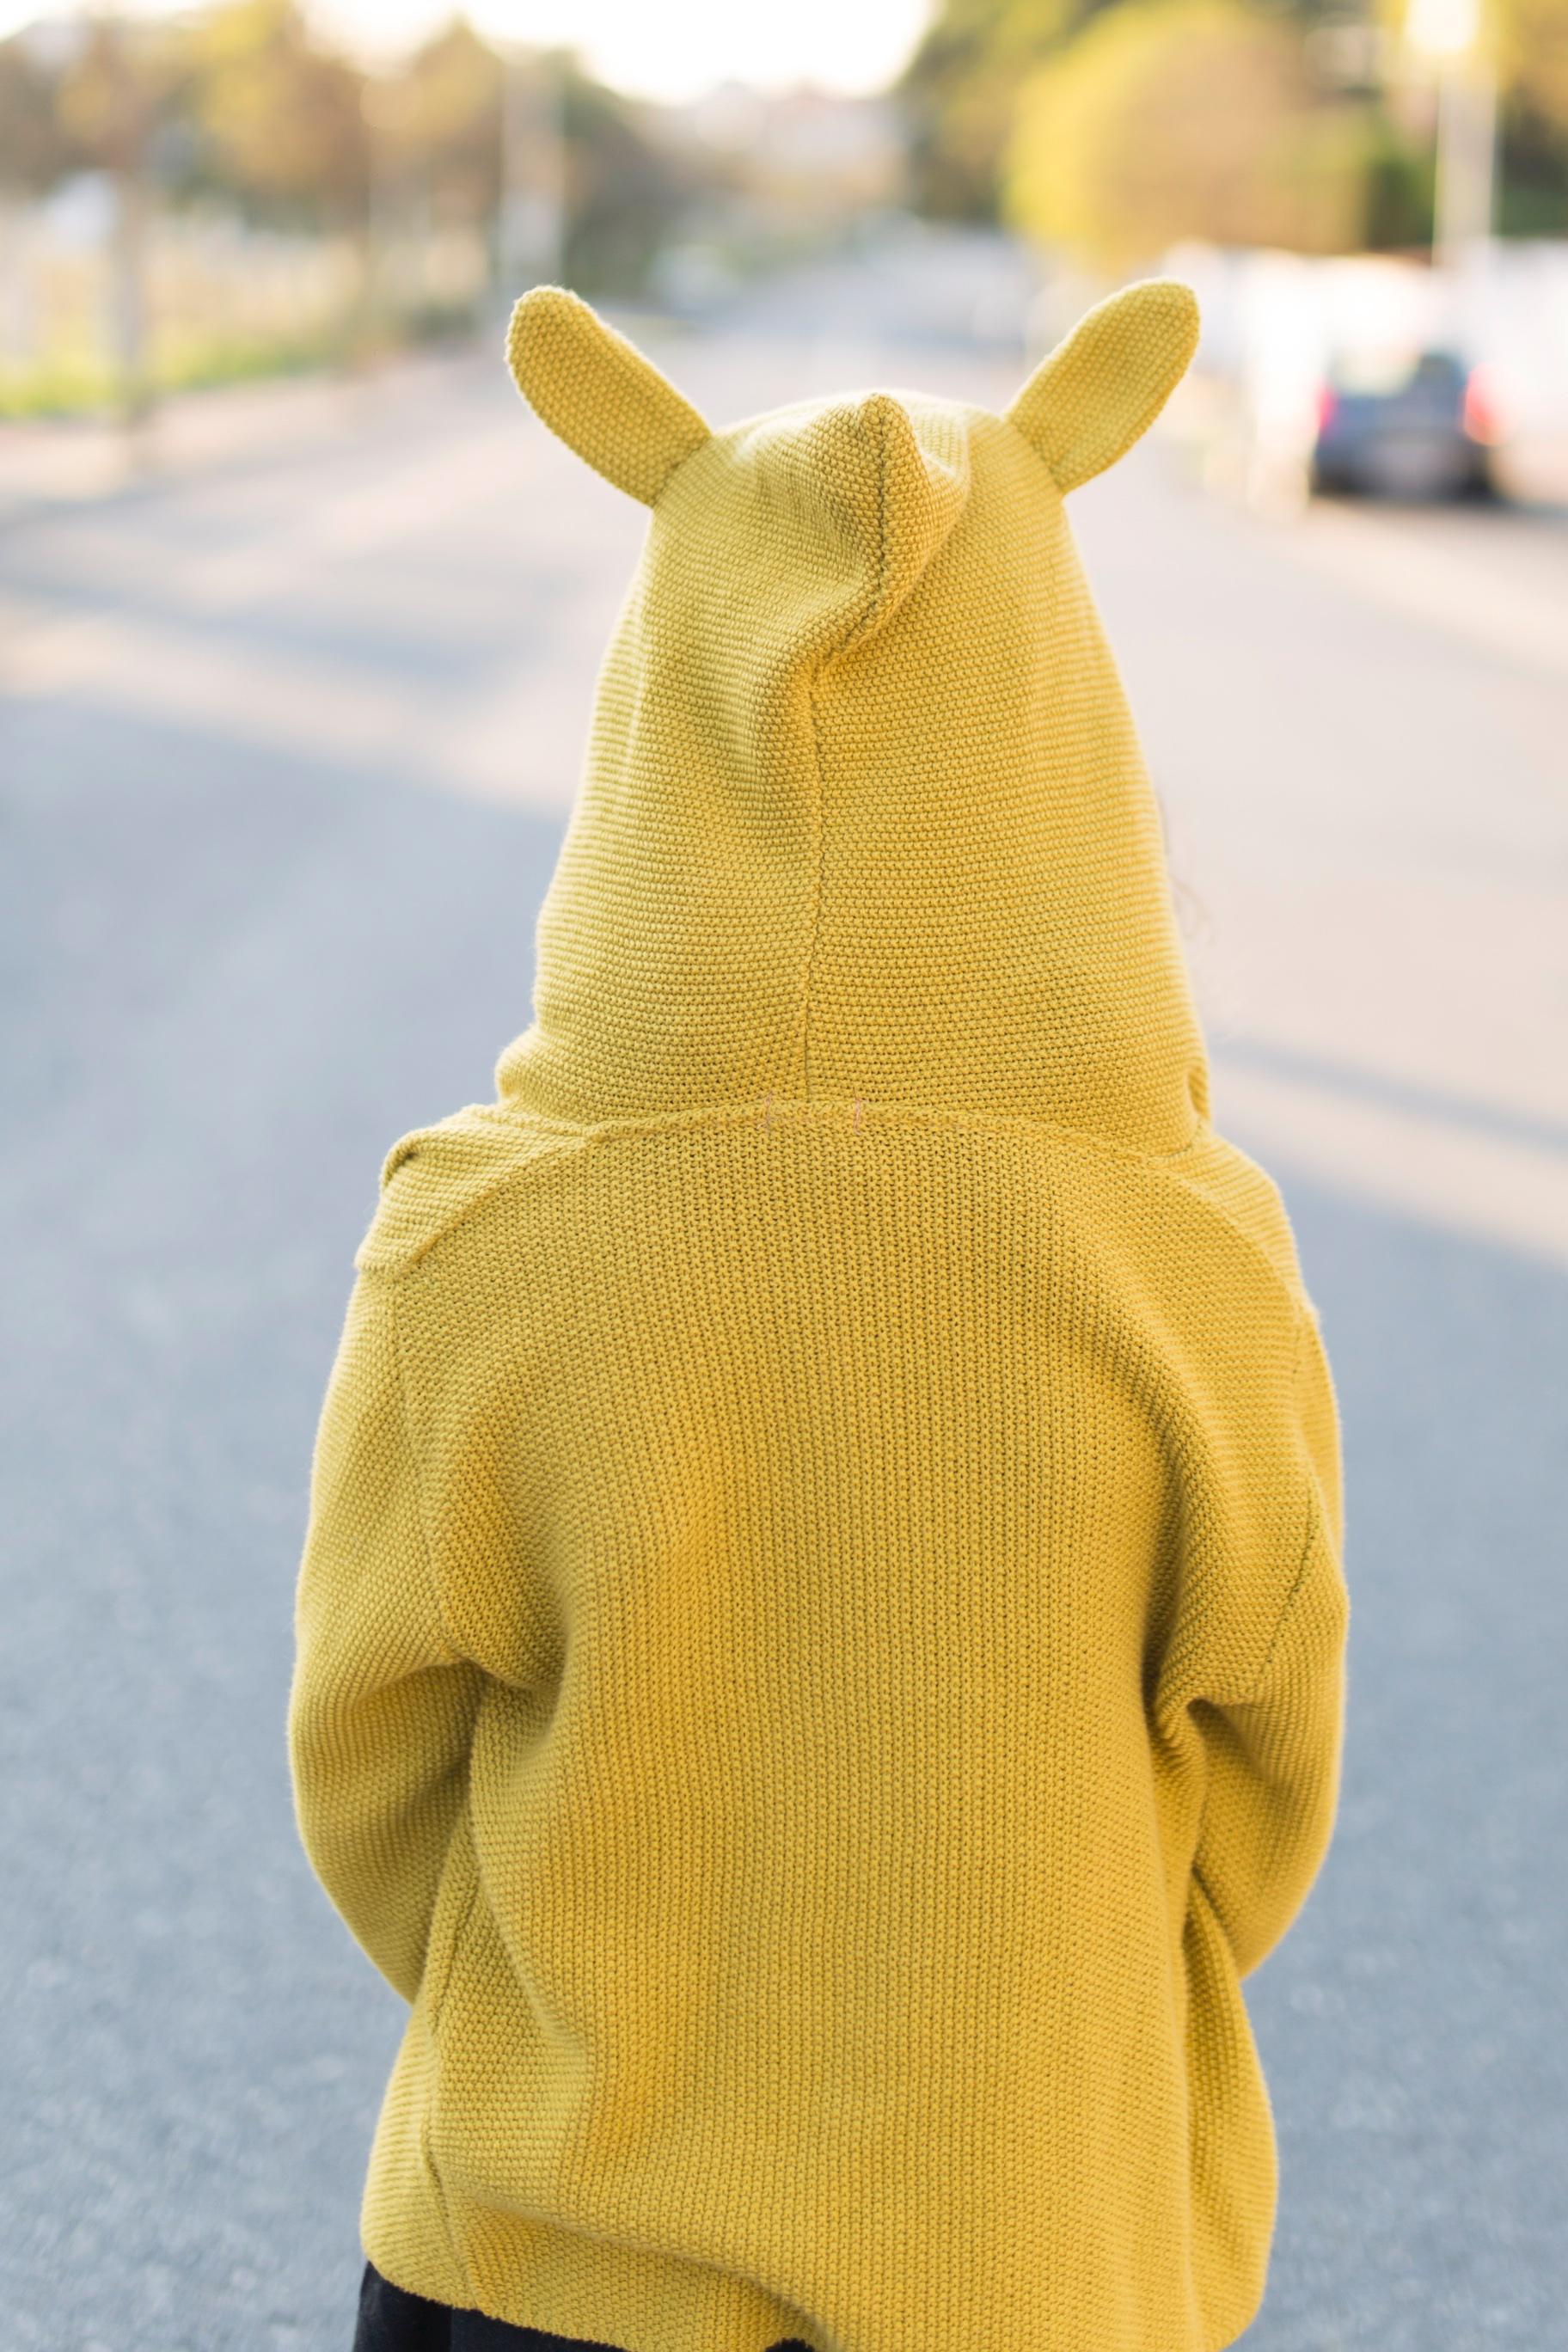 omini-chaqueta-punto-moda-infantil-descalzaporelparque-jimena-look-kids-kids-ministyle-pisamonas-niños-zara-kids